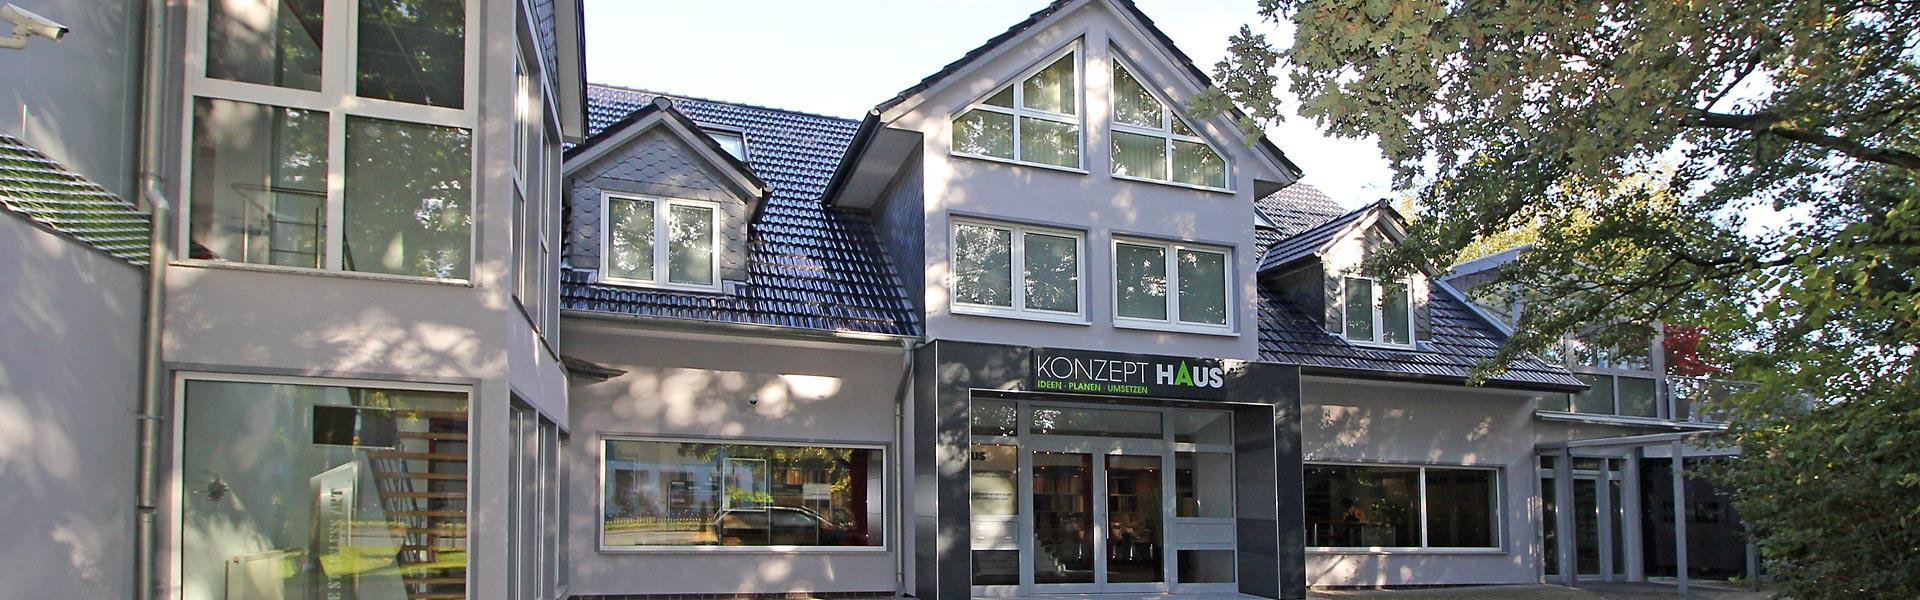 Konzepthaus Becker in Delmenhorst